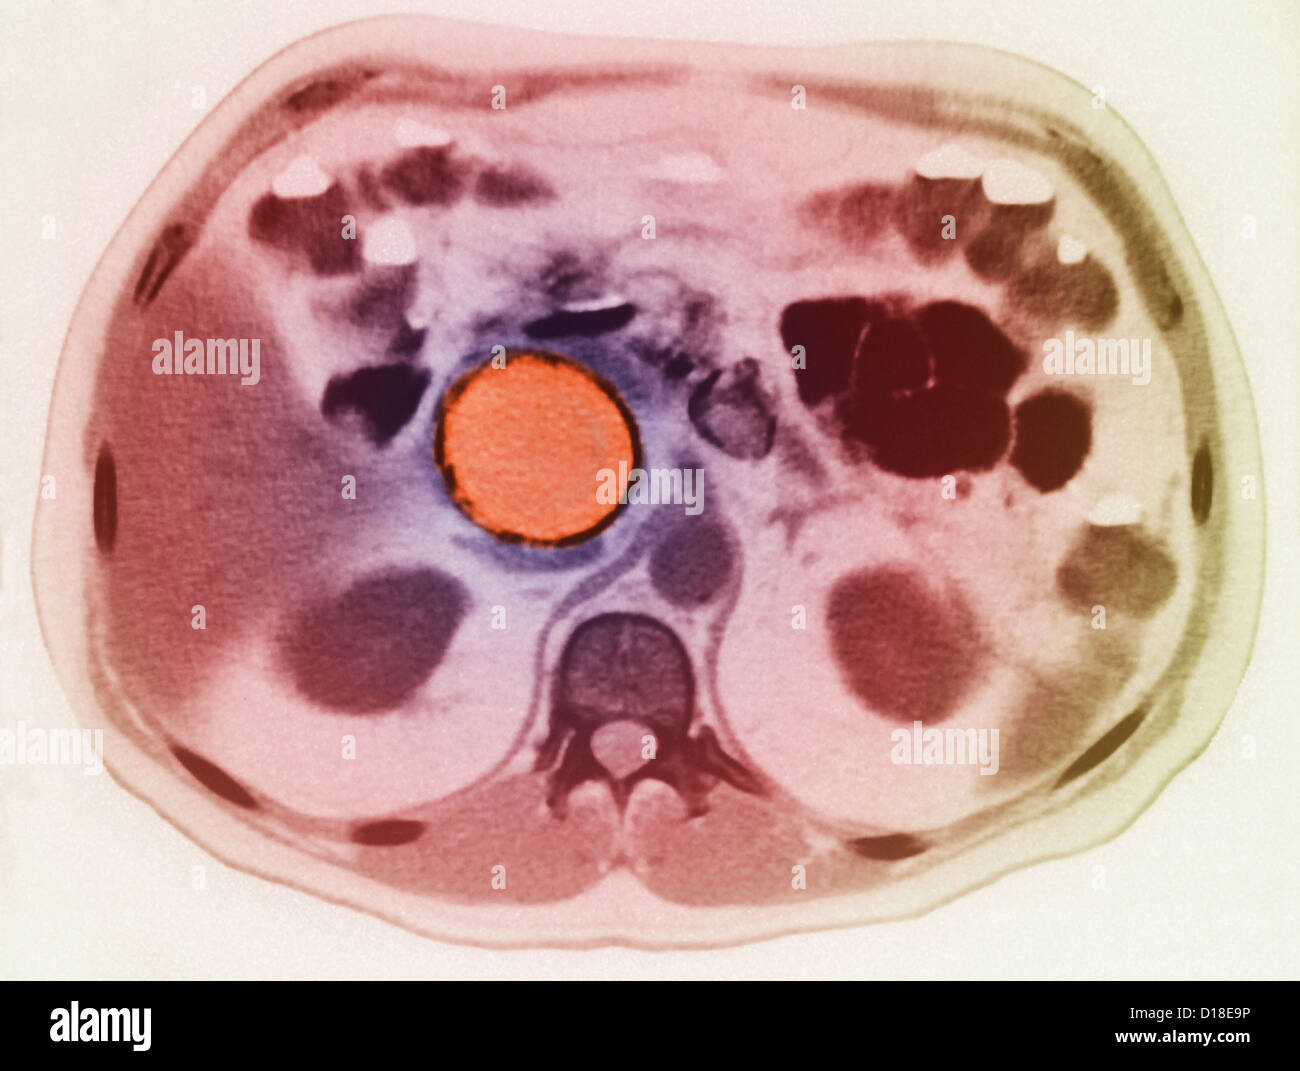 Pancreatic pseudocyst seen on MRI - Stock Image